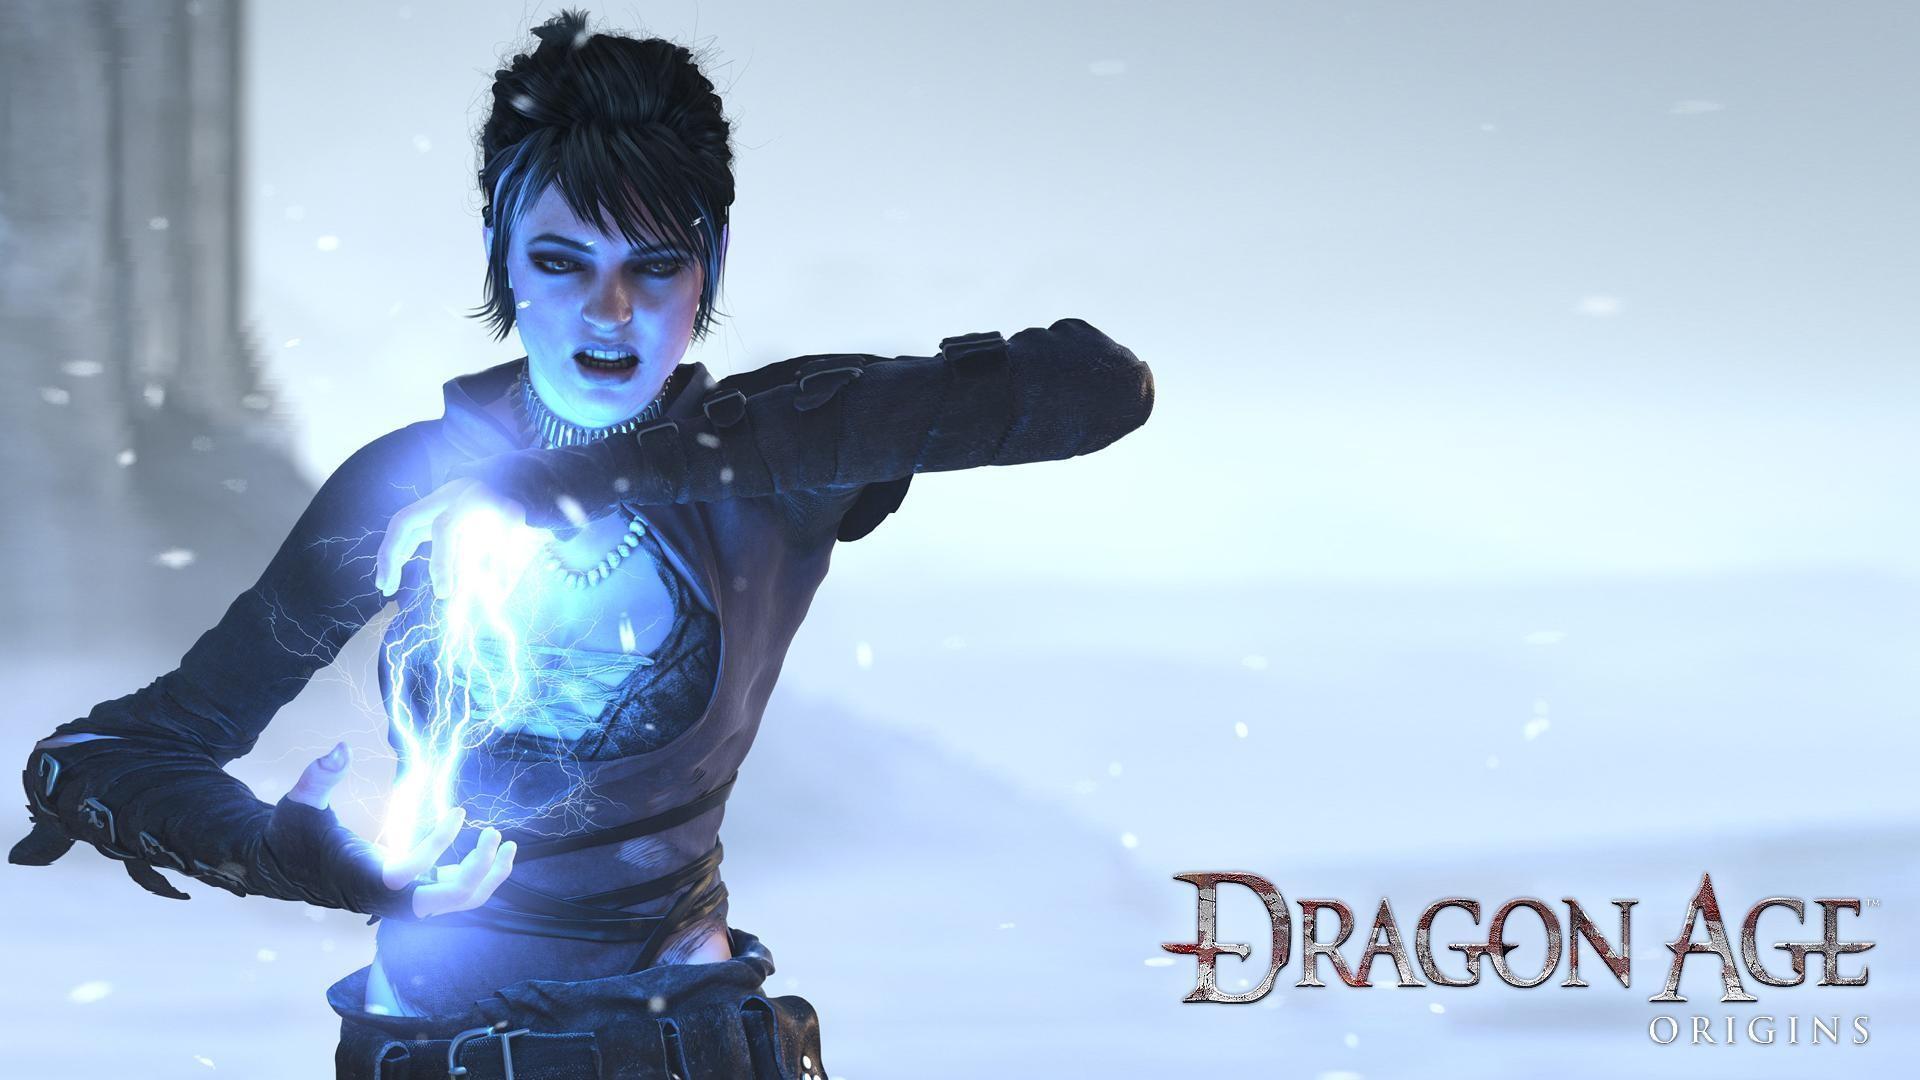 Morrigan – Dragon Age – Origins wallpaper – Free Wide HD Wallpaper